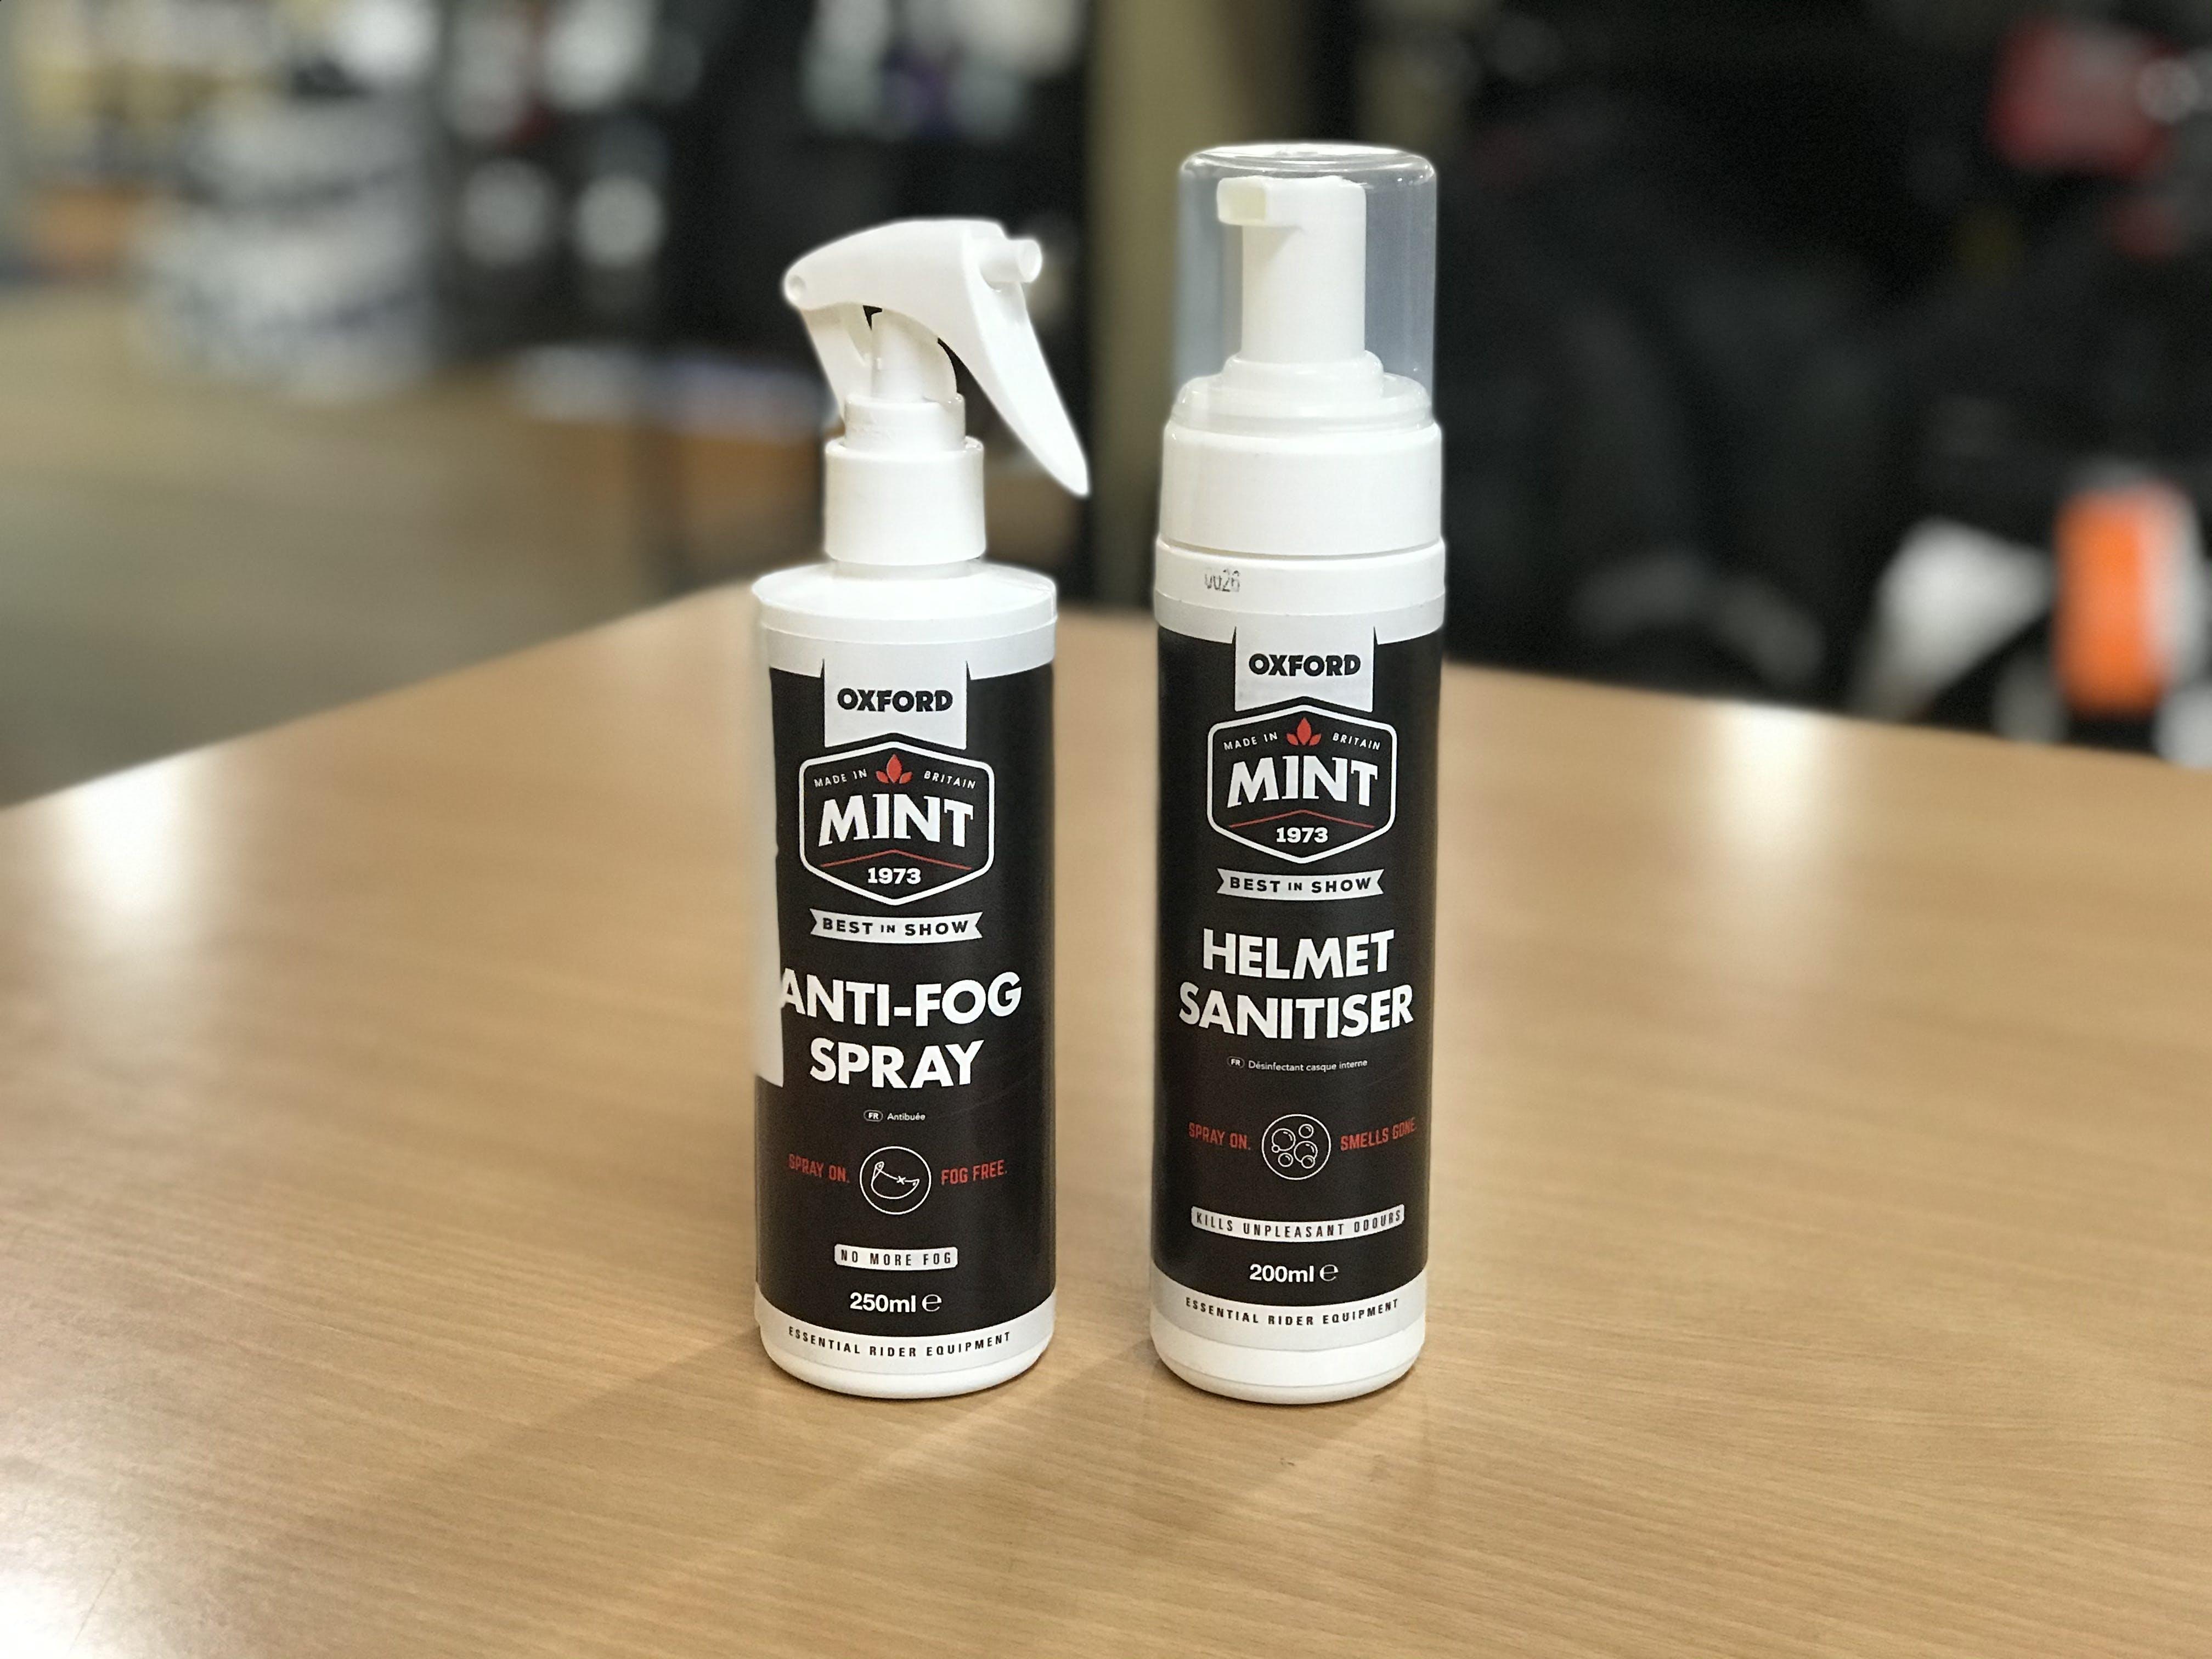 A both each of Mint Anti-Fog Spray & Helmet Sanitiser.